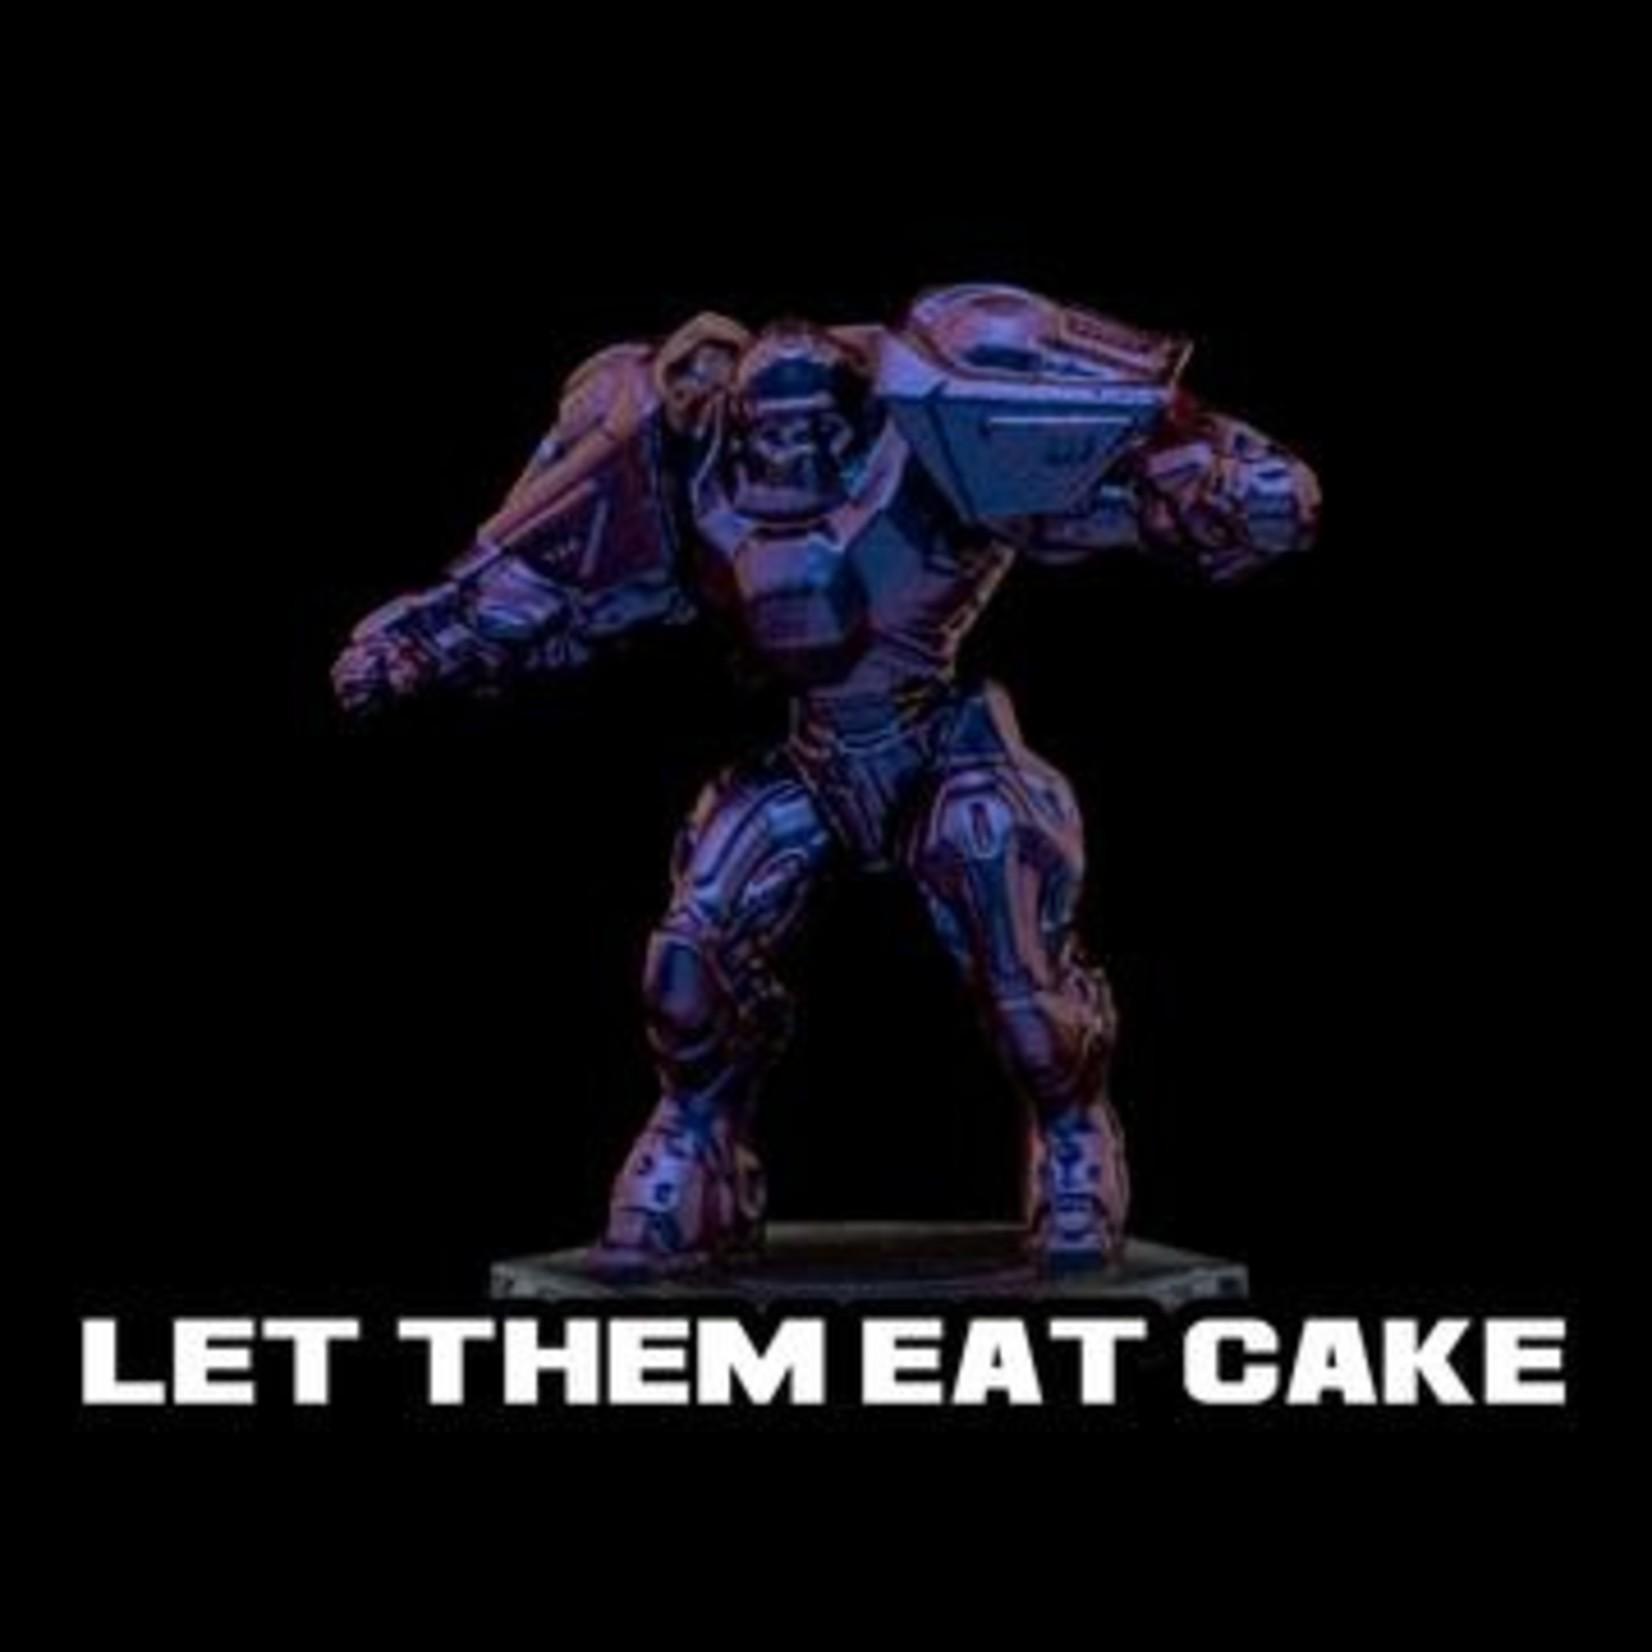 Turbo Dork Let Them Eat Cake (Turboshift)